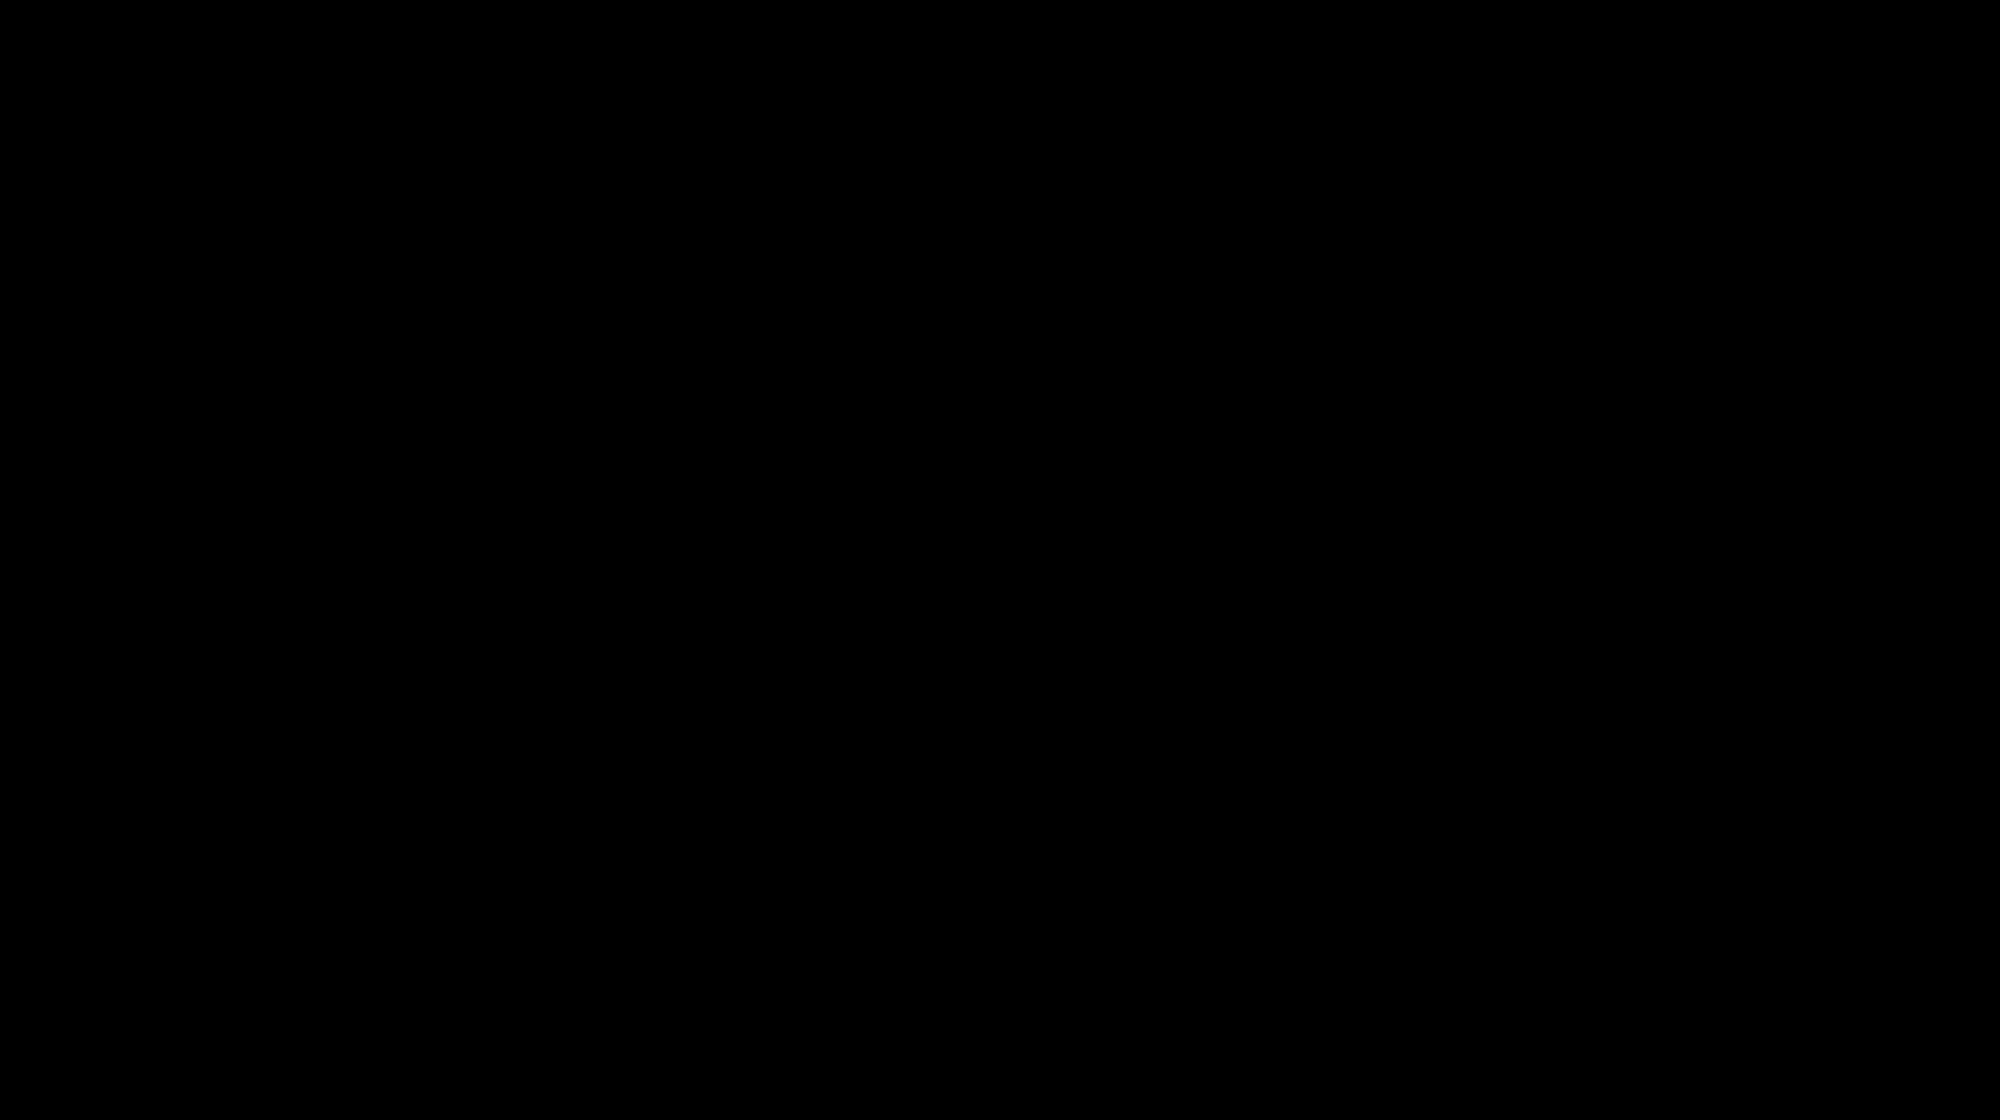 Block arrow clipart clip free stock File:U+2192.svg - Wikimedia Commons clip free stock